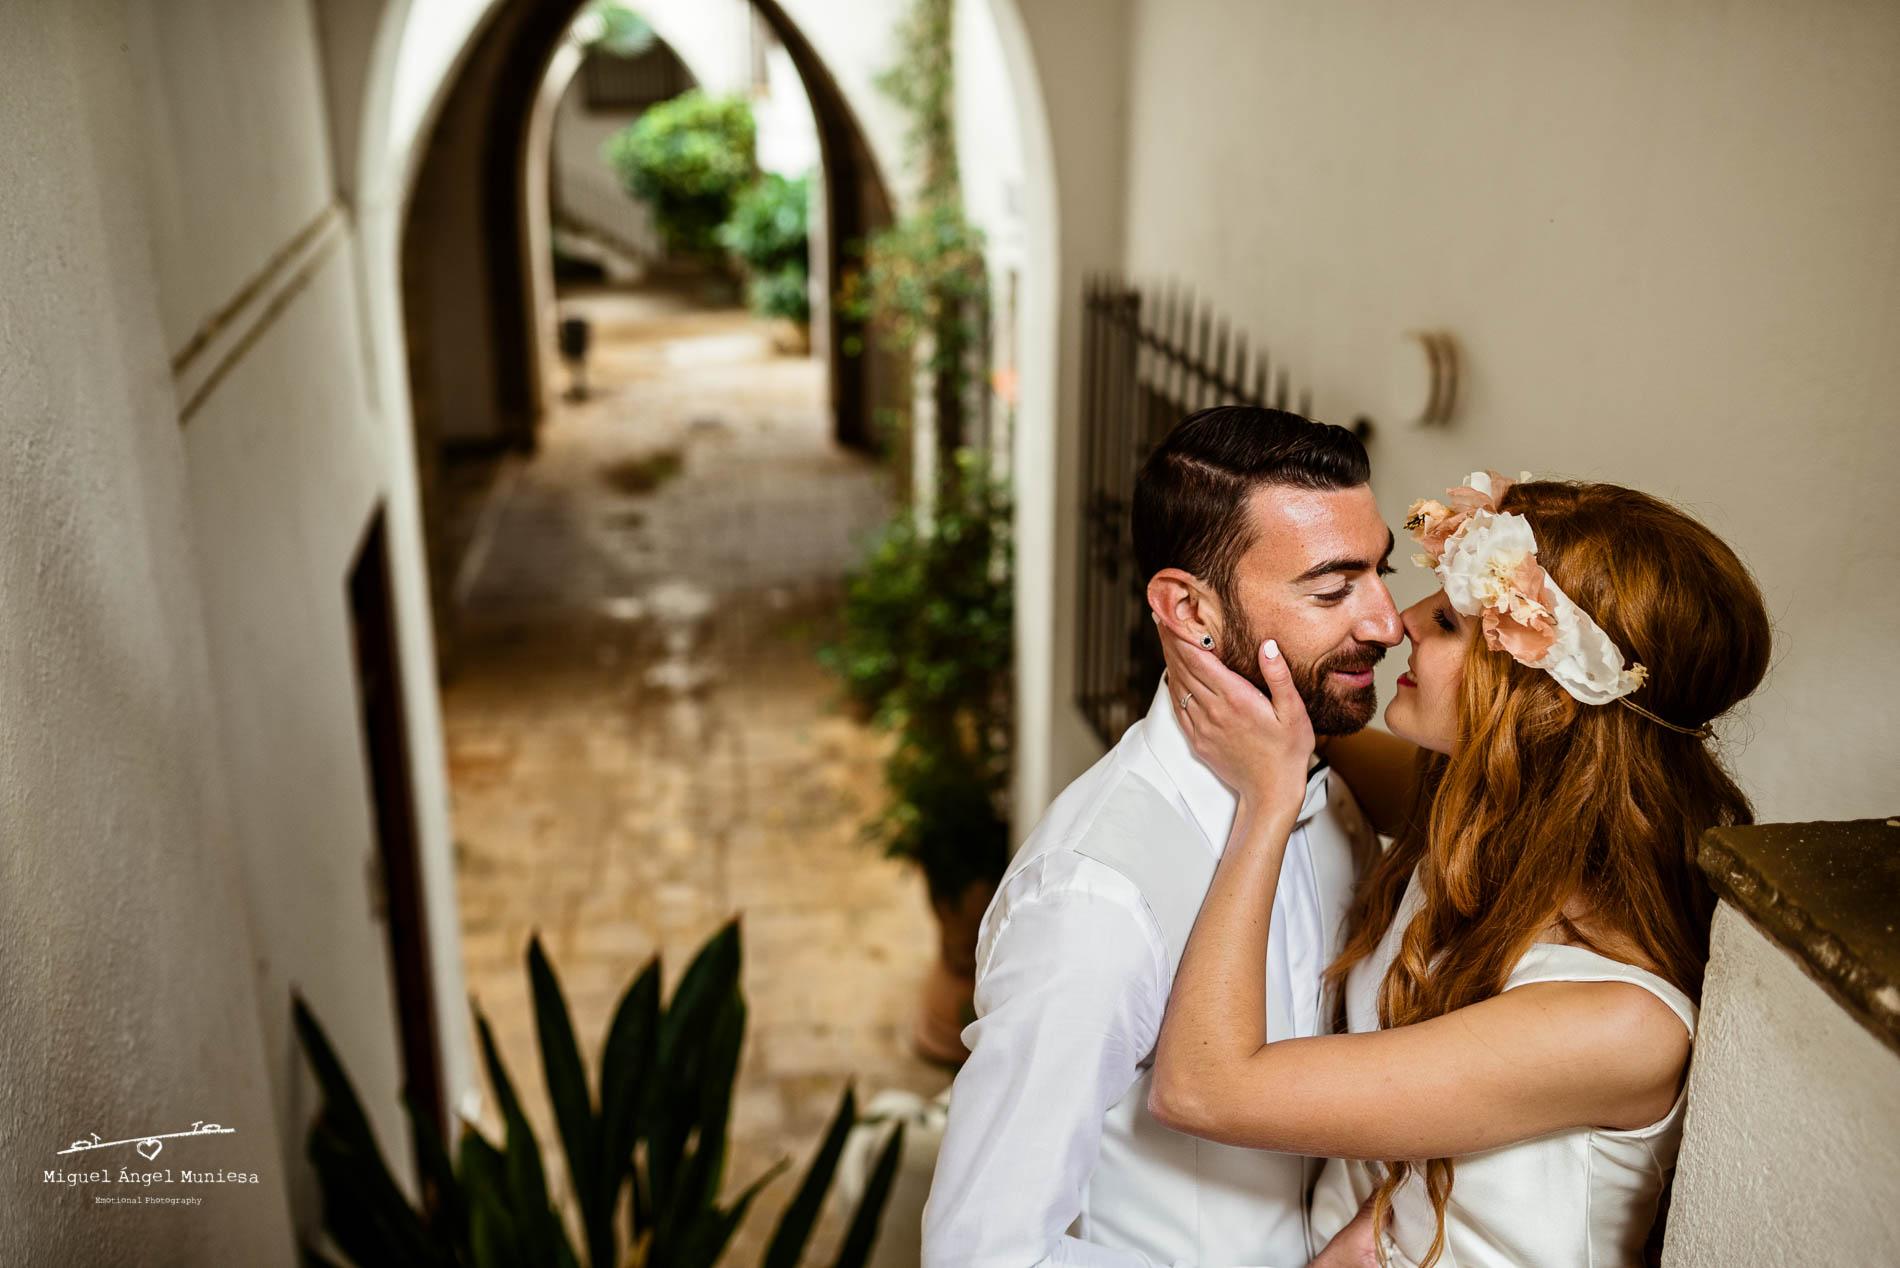 boda, fotografia de boda, boda zaragoza, fotografia, wedding, wedding photography, miguel angel muniesa, fotografo boda Zaragoza, fotografo boda, destination wedding_ 0008